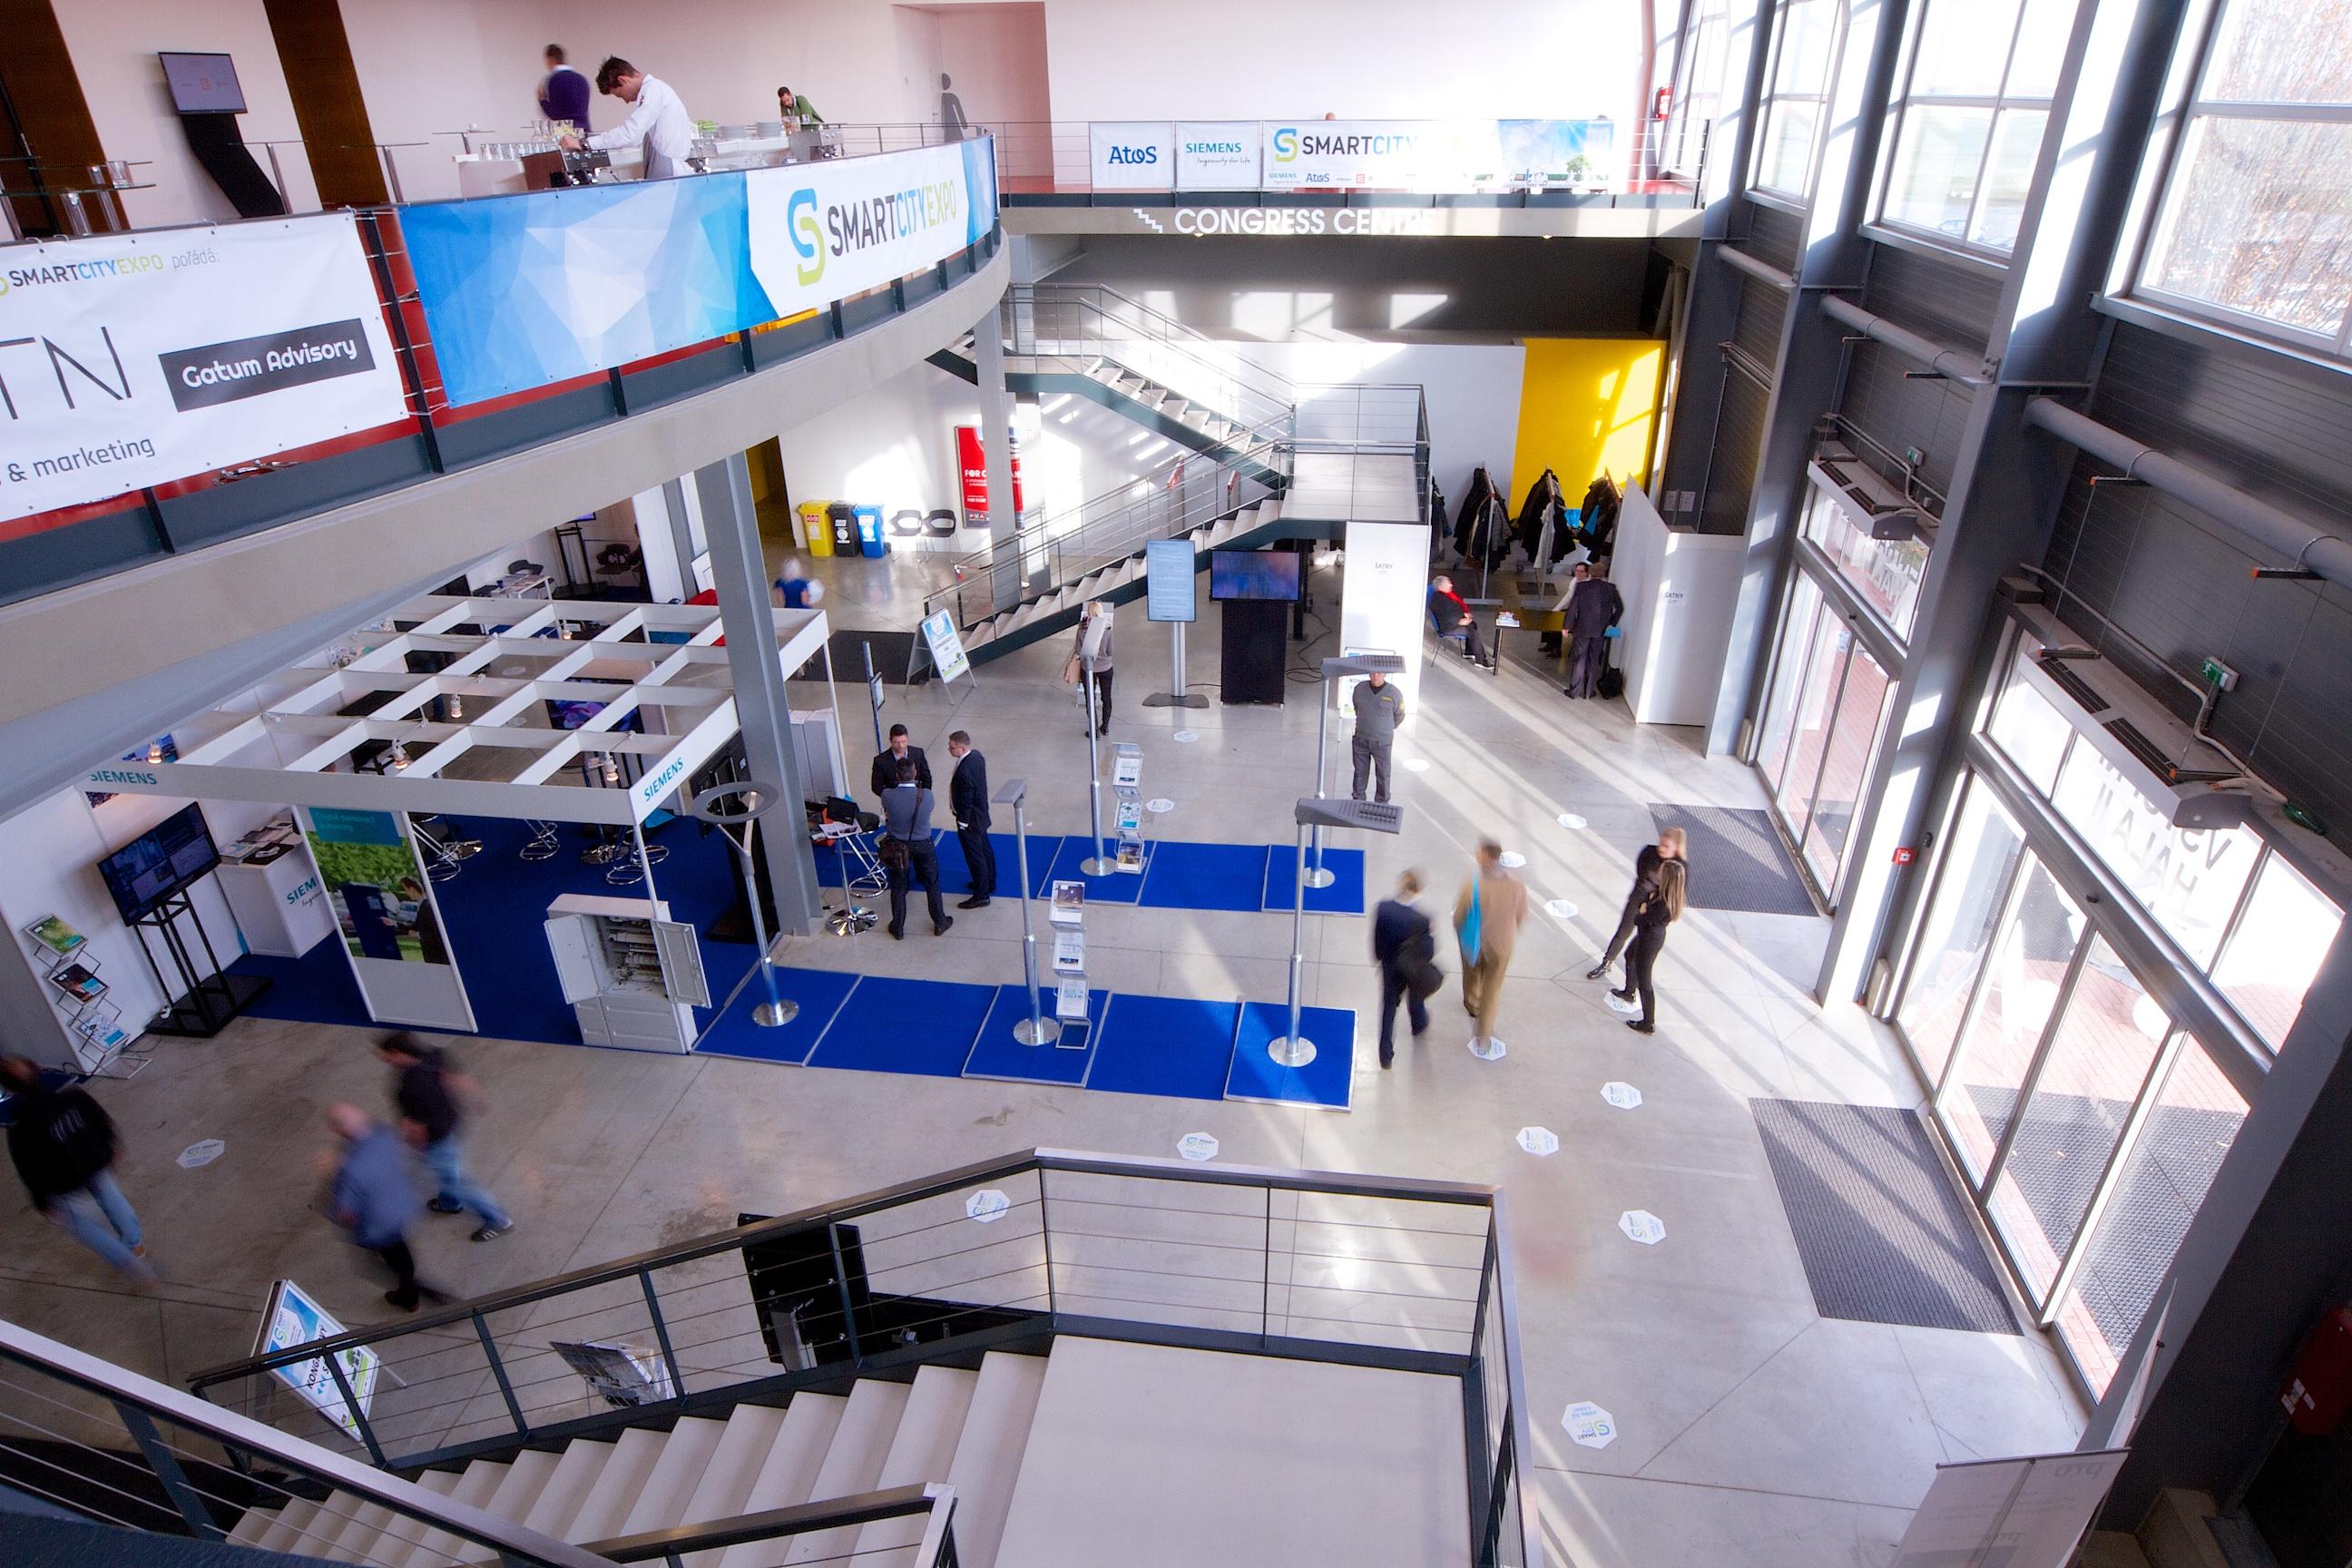 Smart City Expo 2016